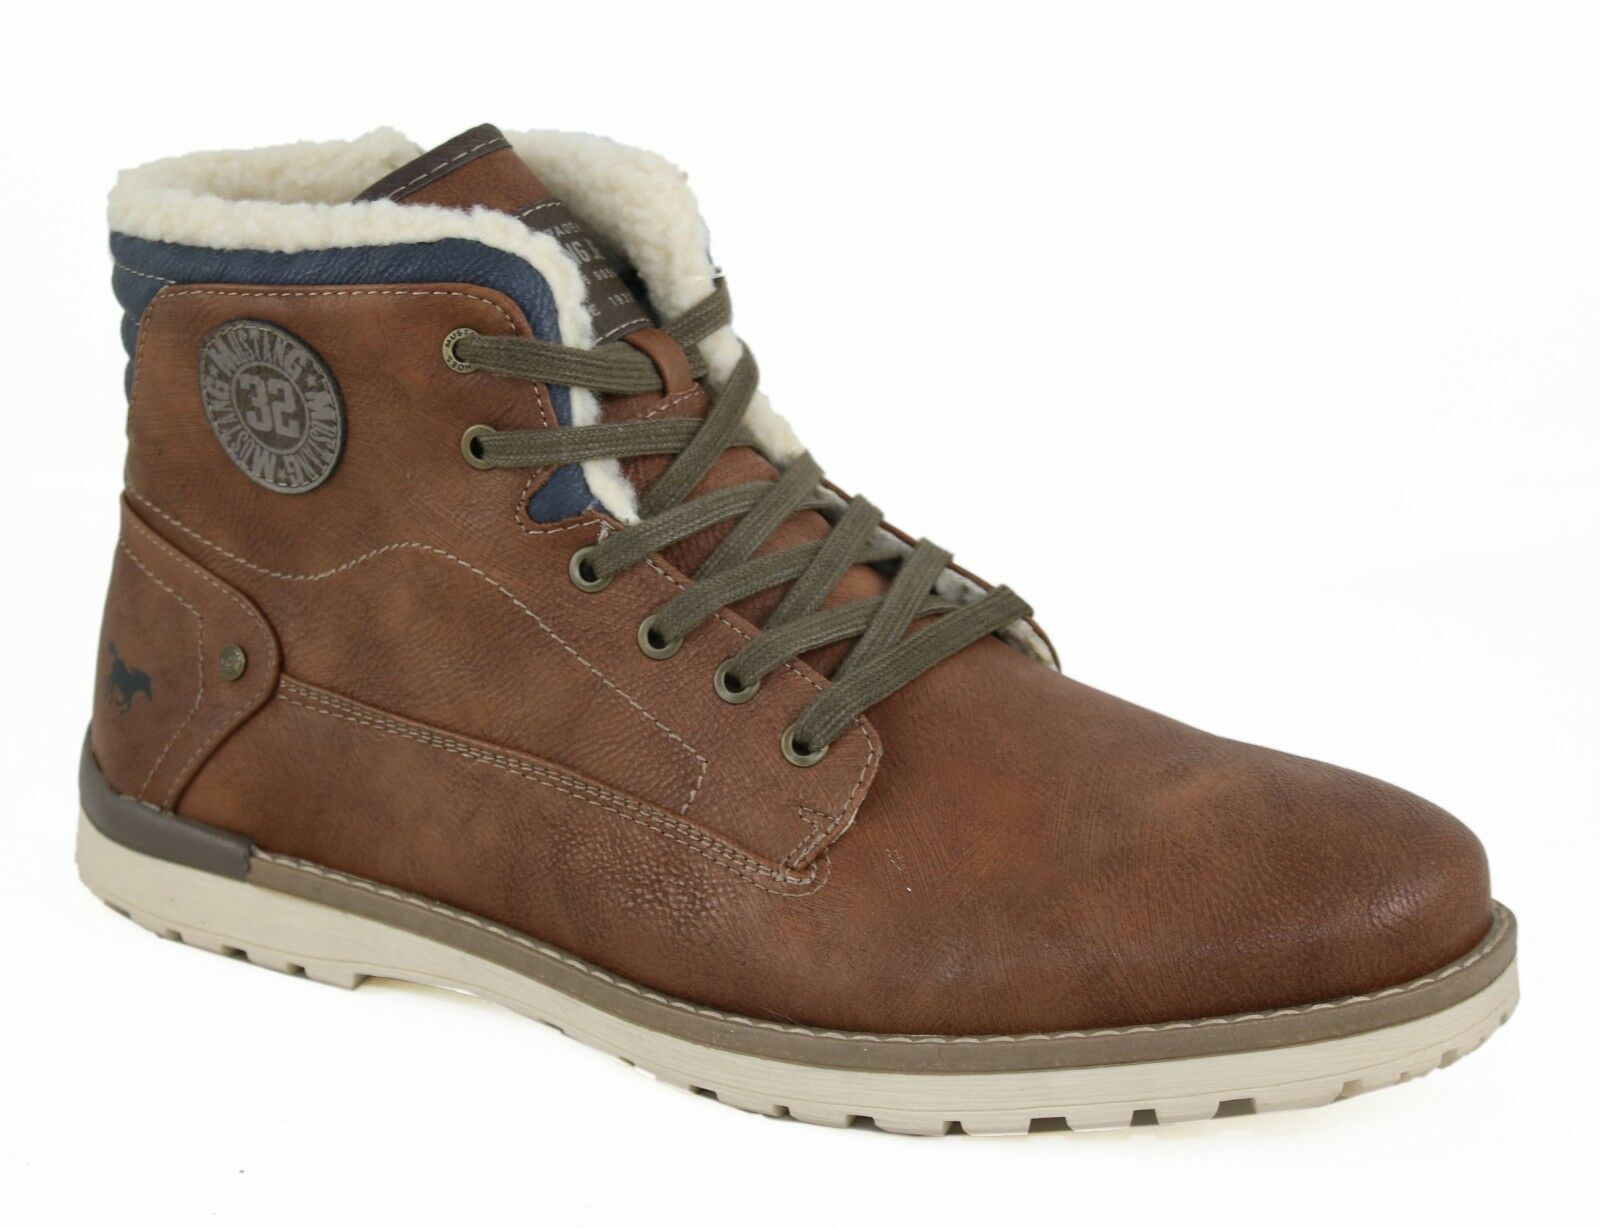 MUSTANG Herren Schnür-Stiefel Stiefel 4092-602-301 C42